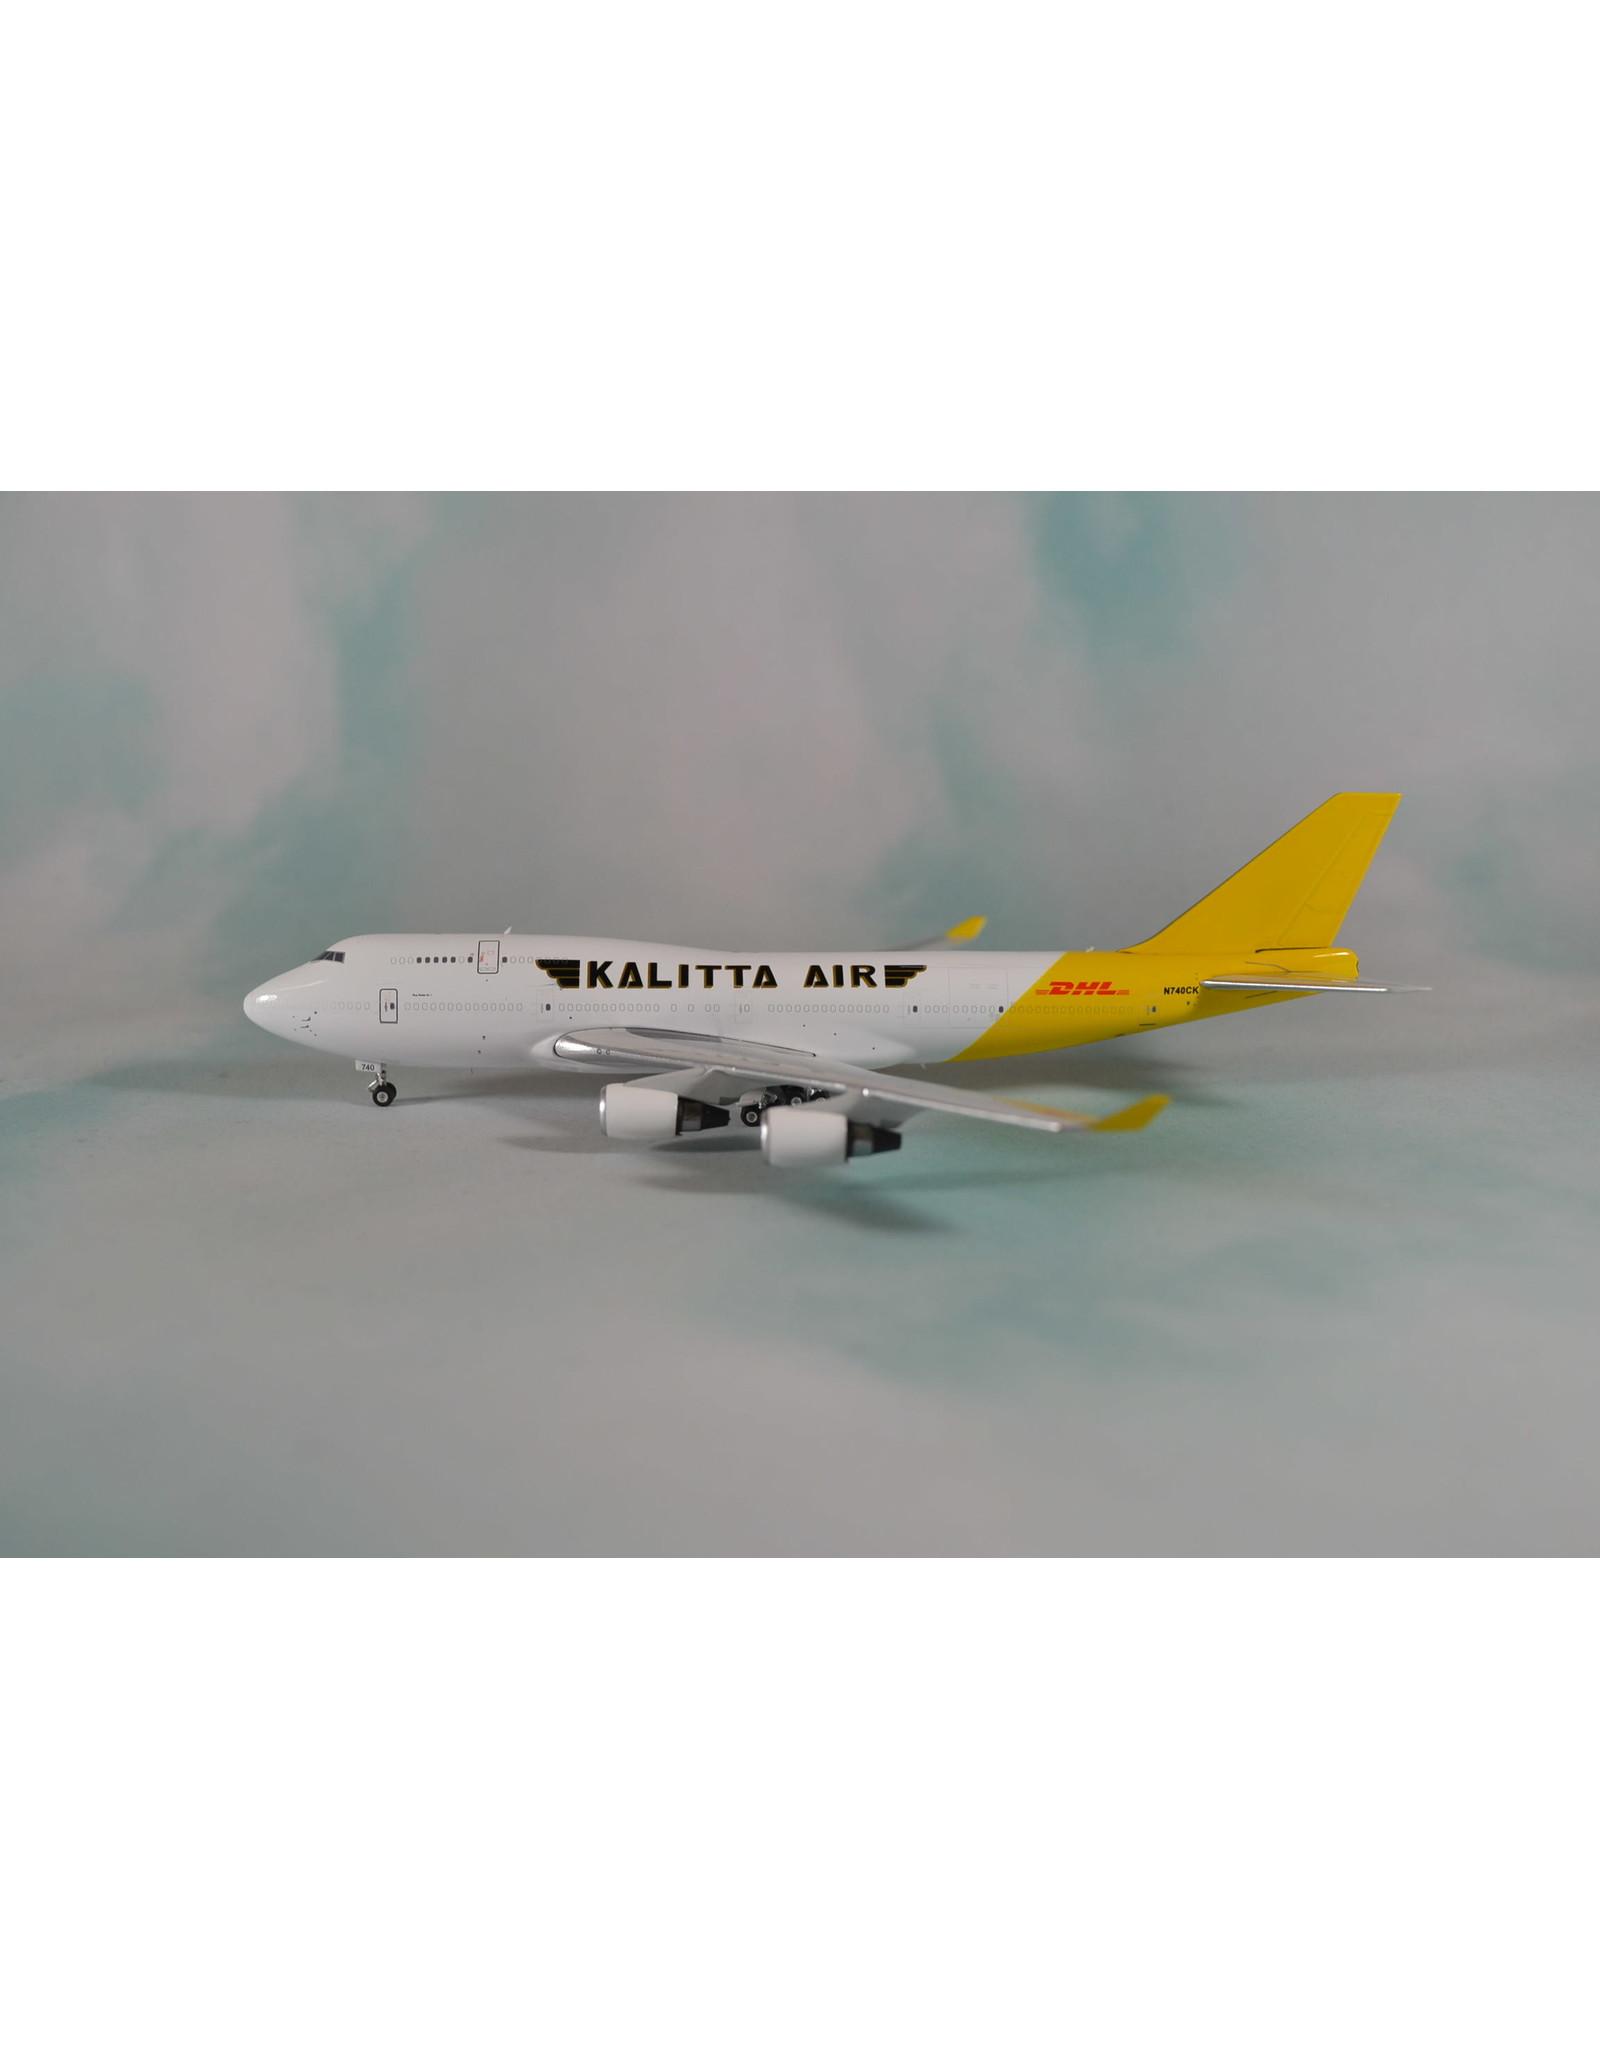 Phoenix PH4 Kalitta 747-400BCF DHL tail